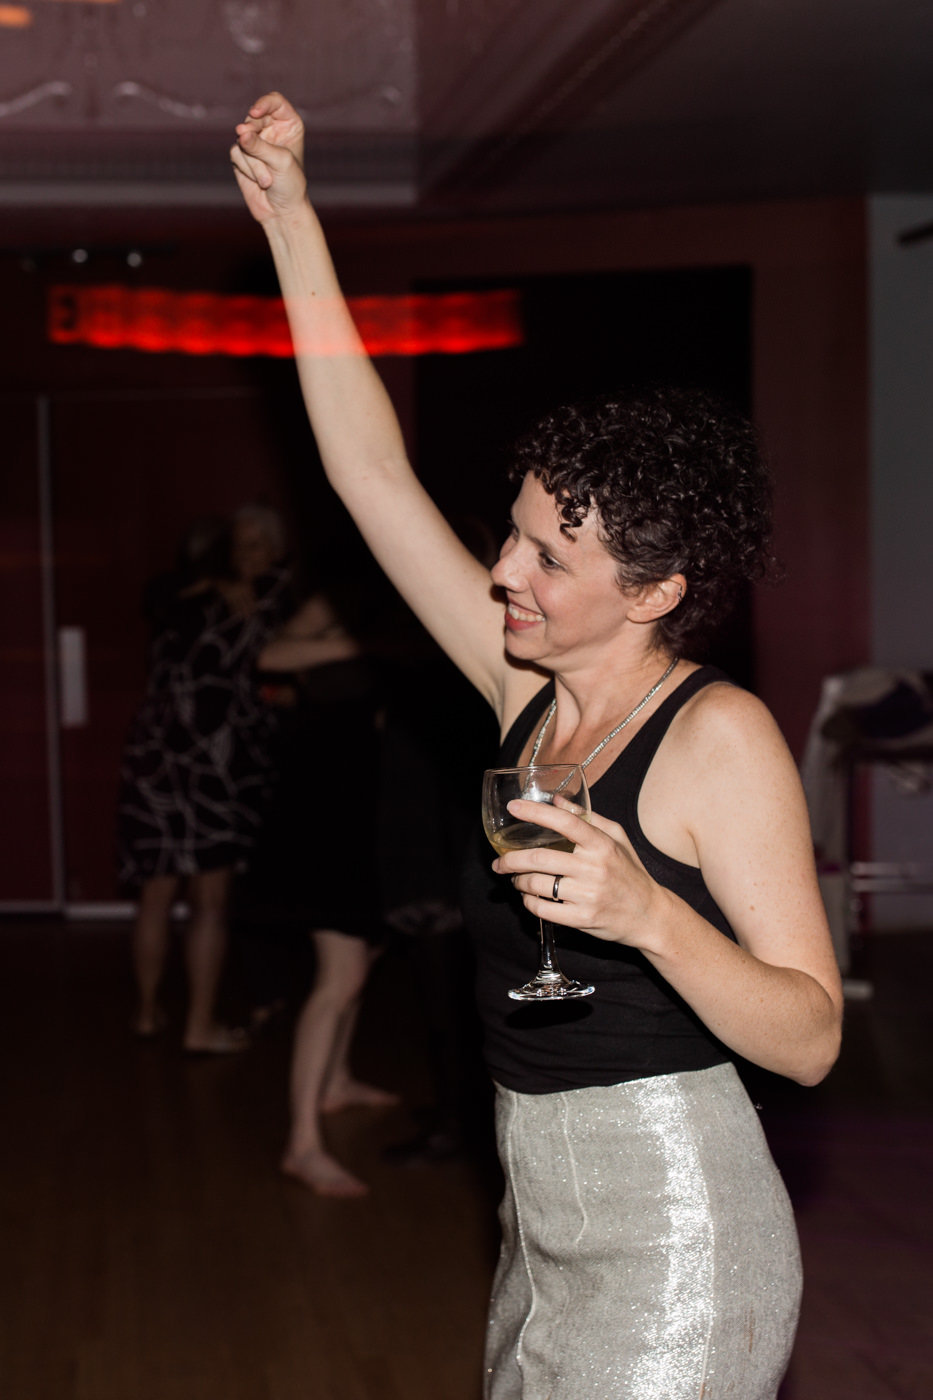 Mt Tremper Arts Gala -  NYC event photographer Kamp Weddings-35.jpg